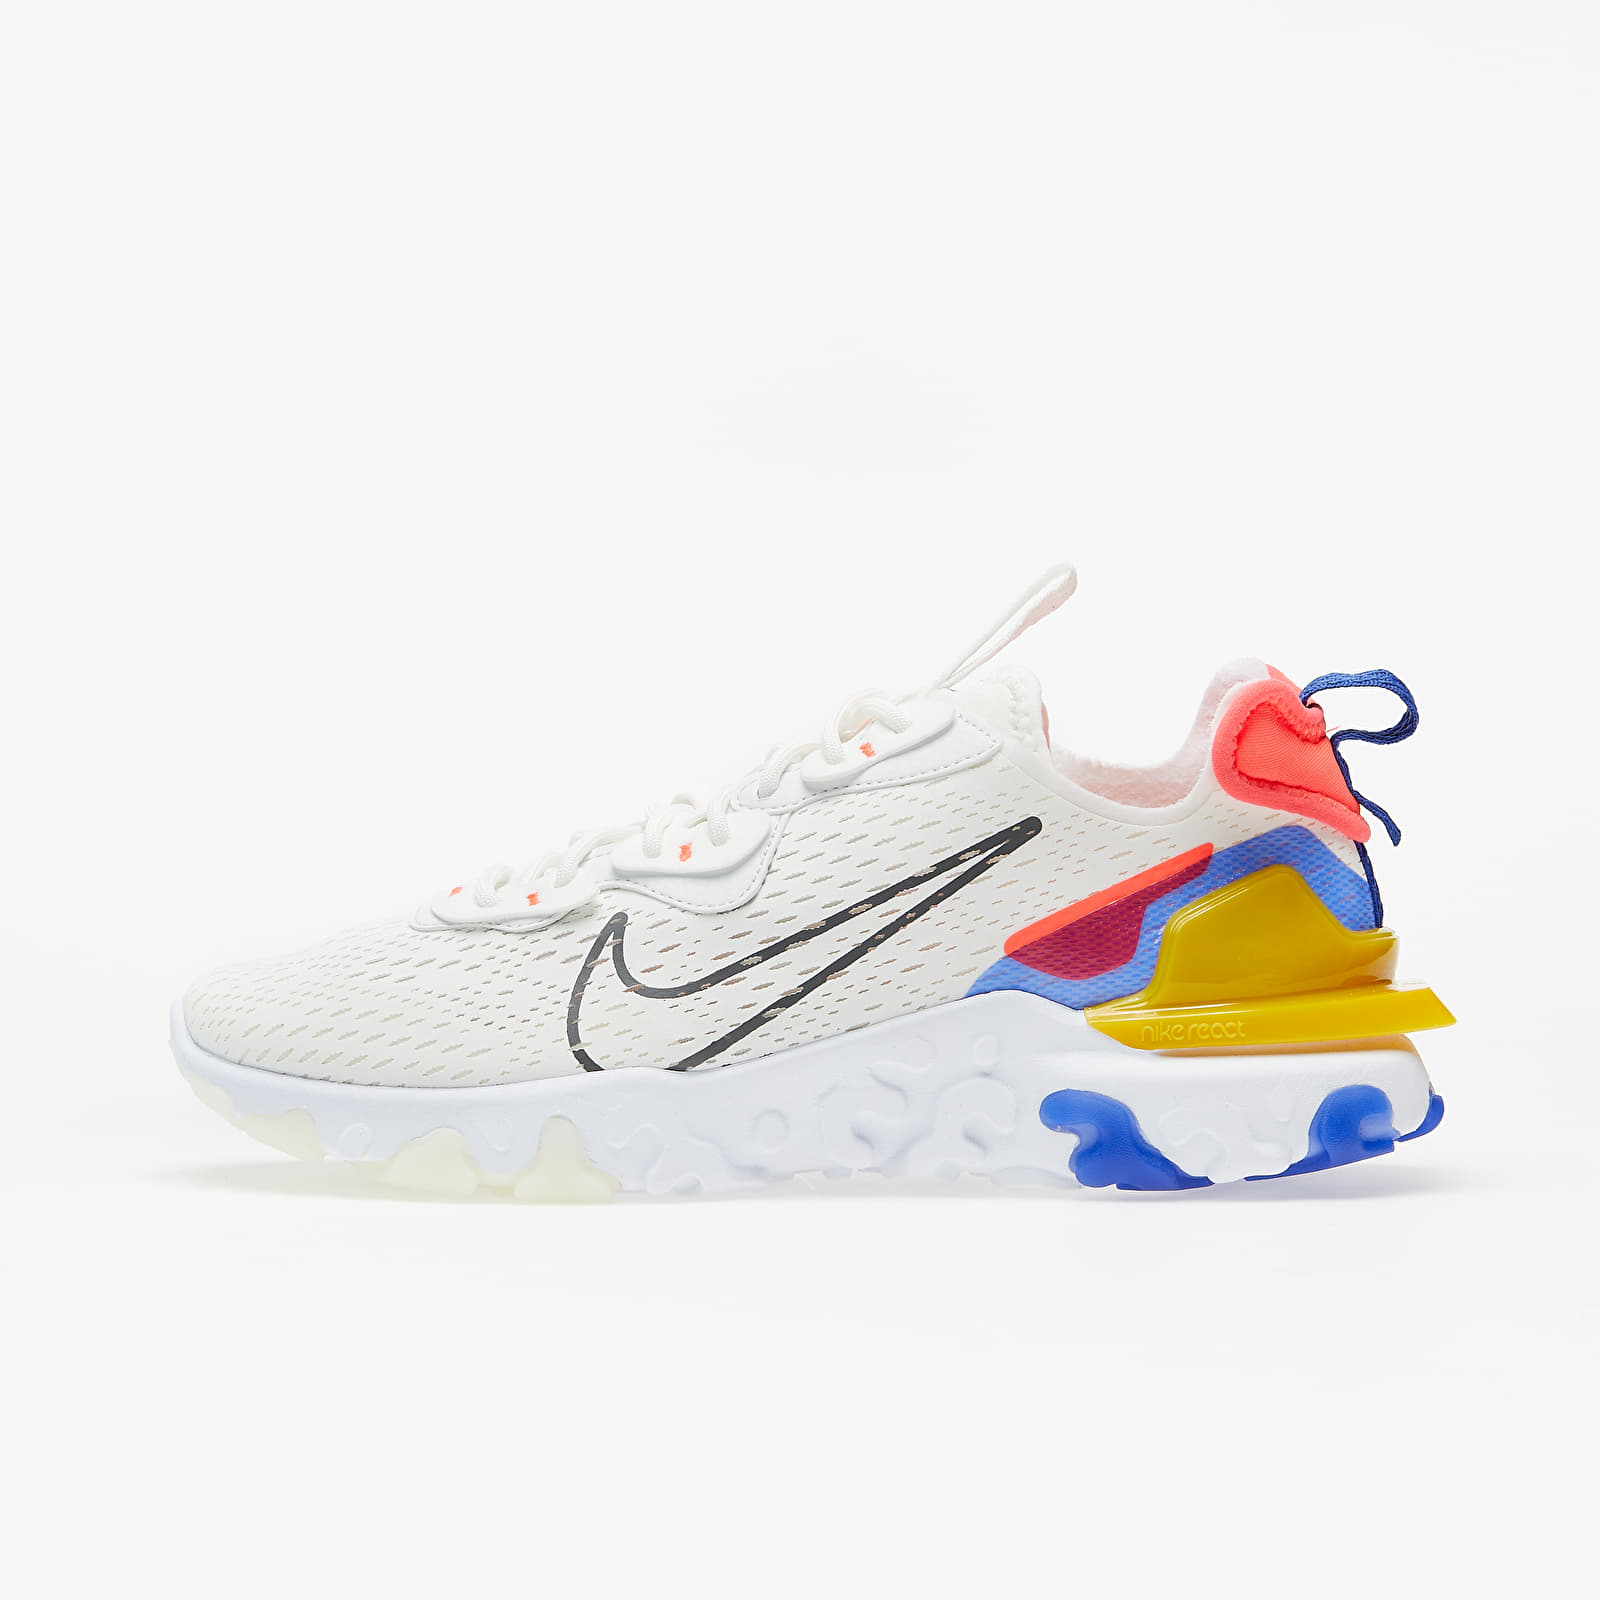 Încălțăminte și sneakerși pentru femei Nike W React Vision Summit White/ Iron Grey-Astronomy Blue